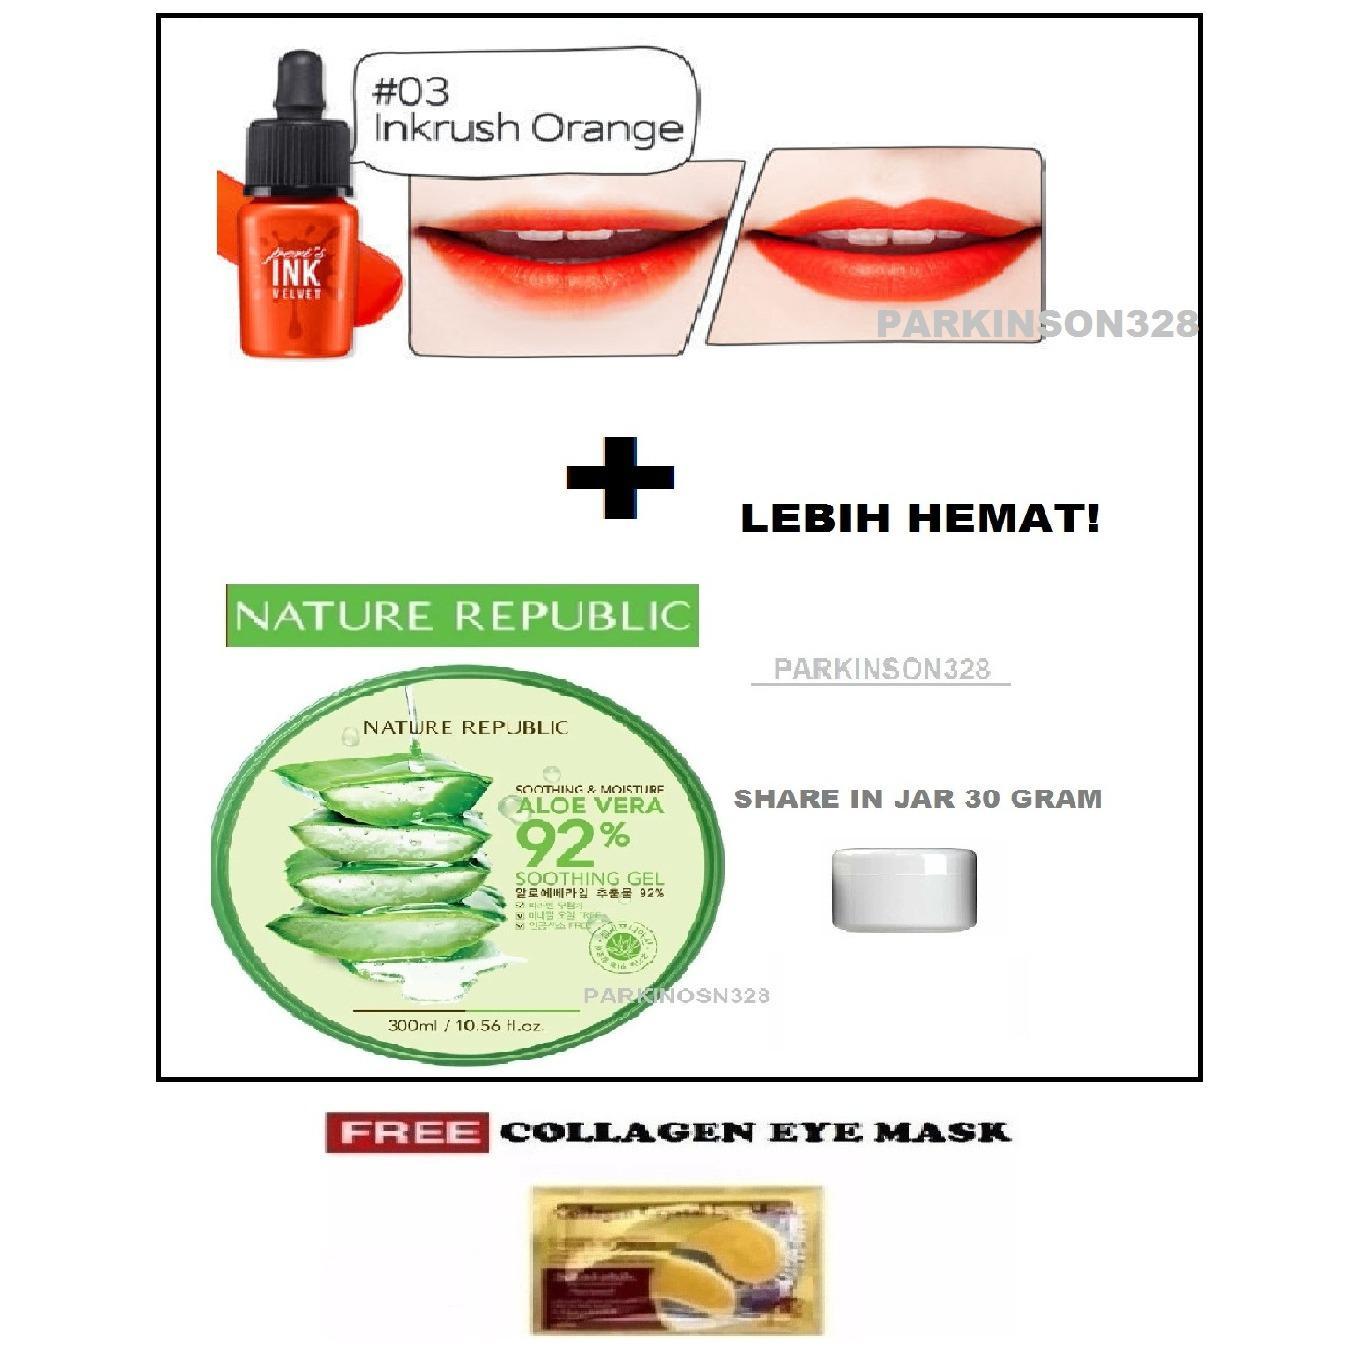 Lipstick Aloe Vera Soothing Gel Termurah Oktober 2018 Promo Market Terlaris 92 Nature Republik Cream Ajaib Serbaguna Peripera Peris Ink Velvet Original 03 Inkrush Orange 1 Buah Republic